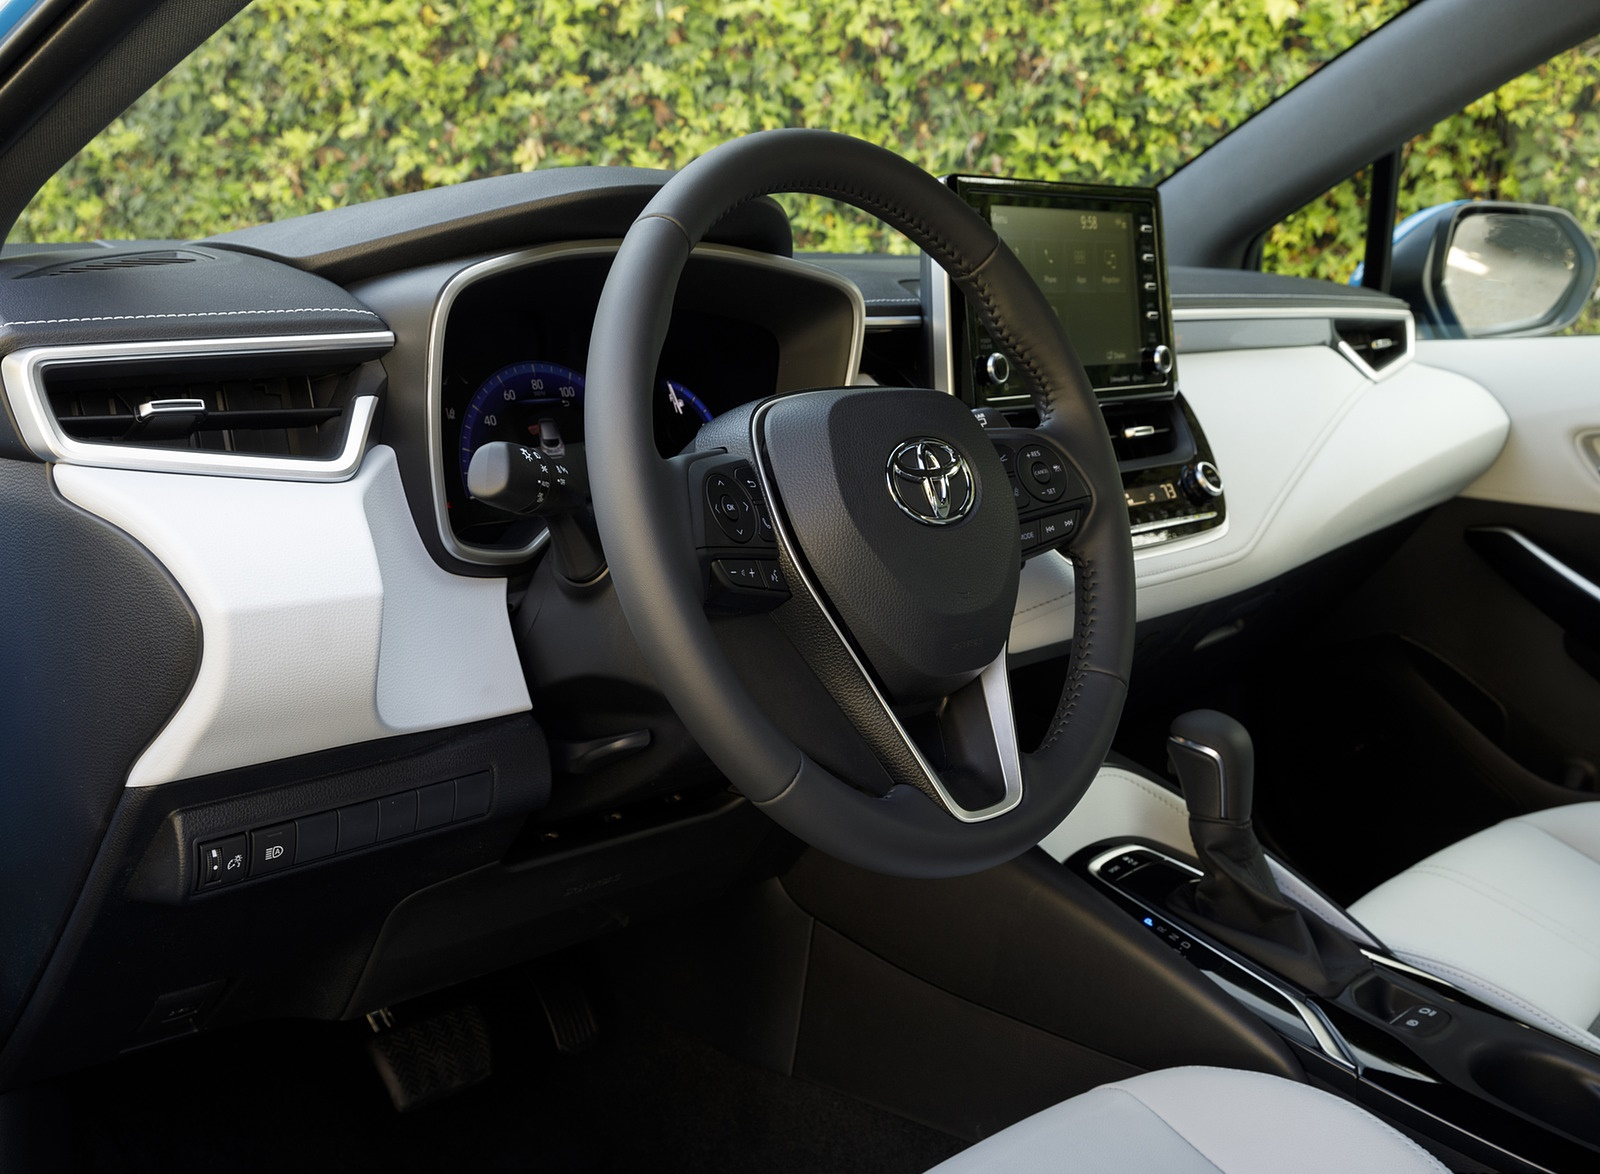 2019 Toyota Corolla Hatchback Interior Wallpapers #49 of 75